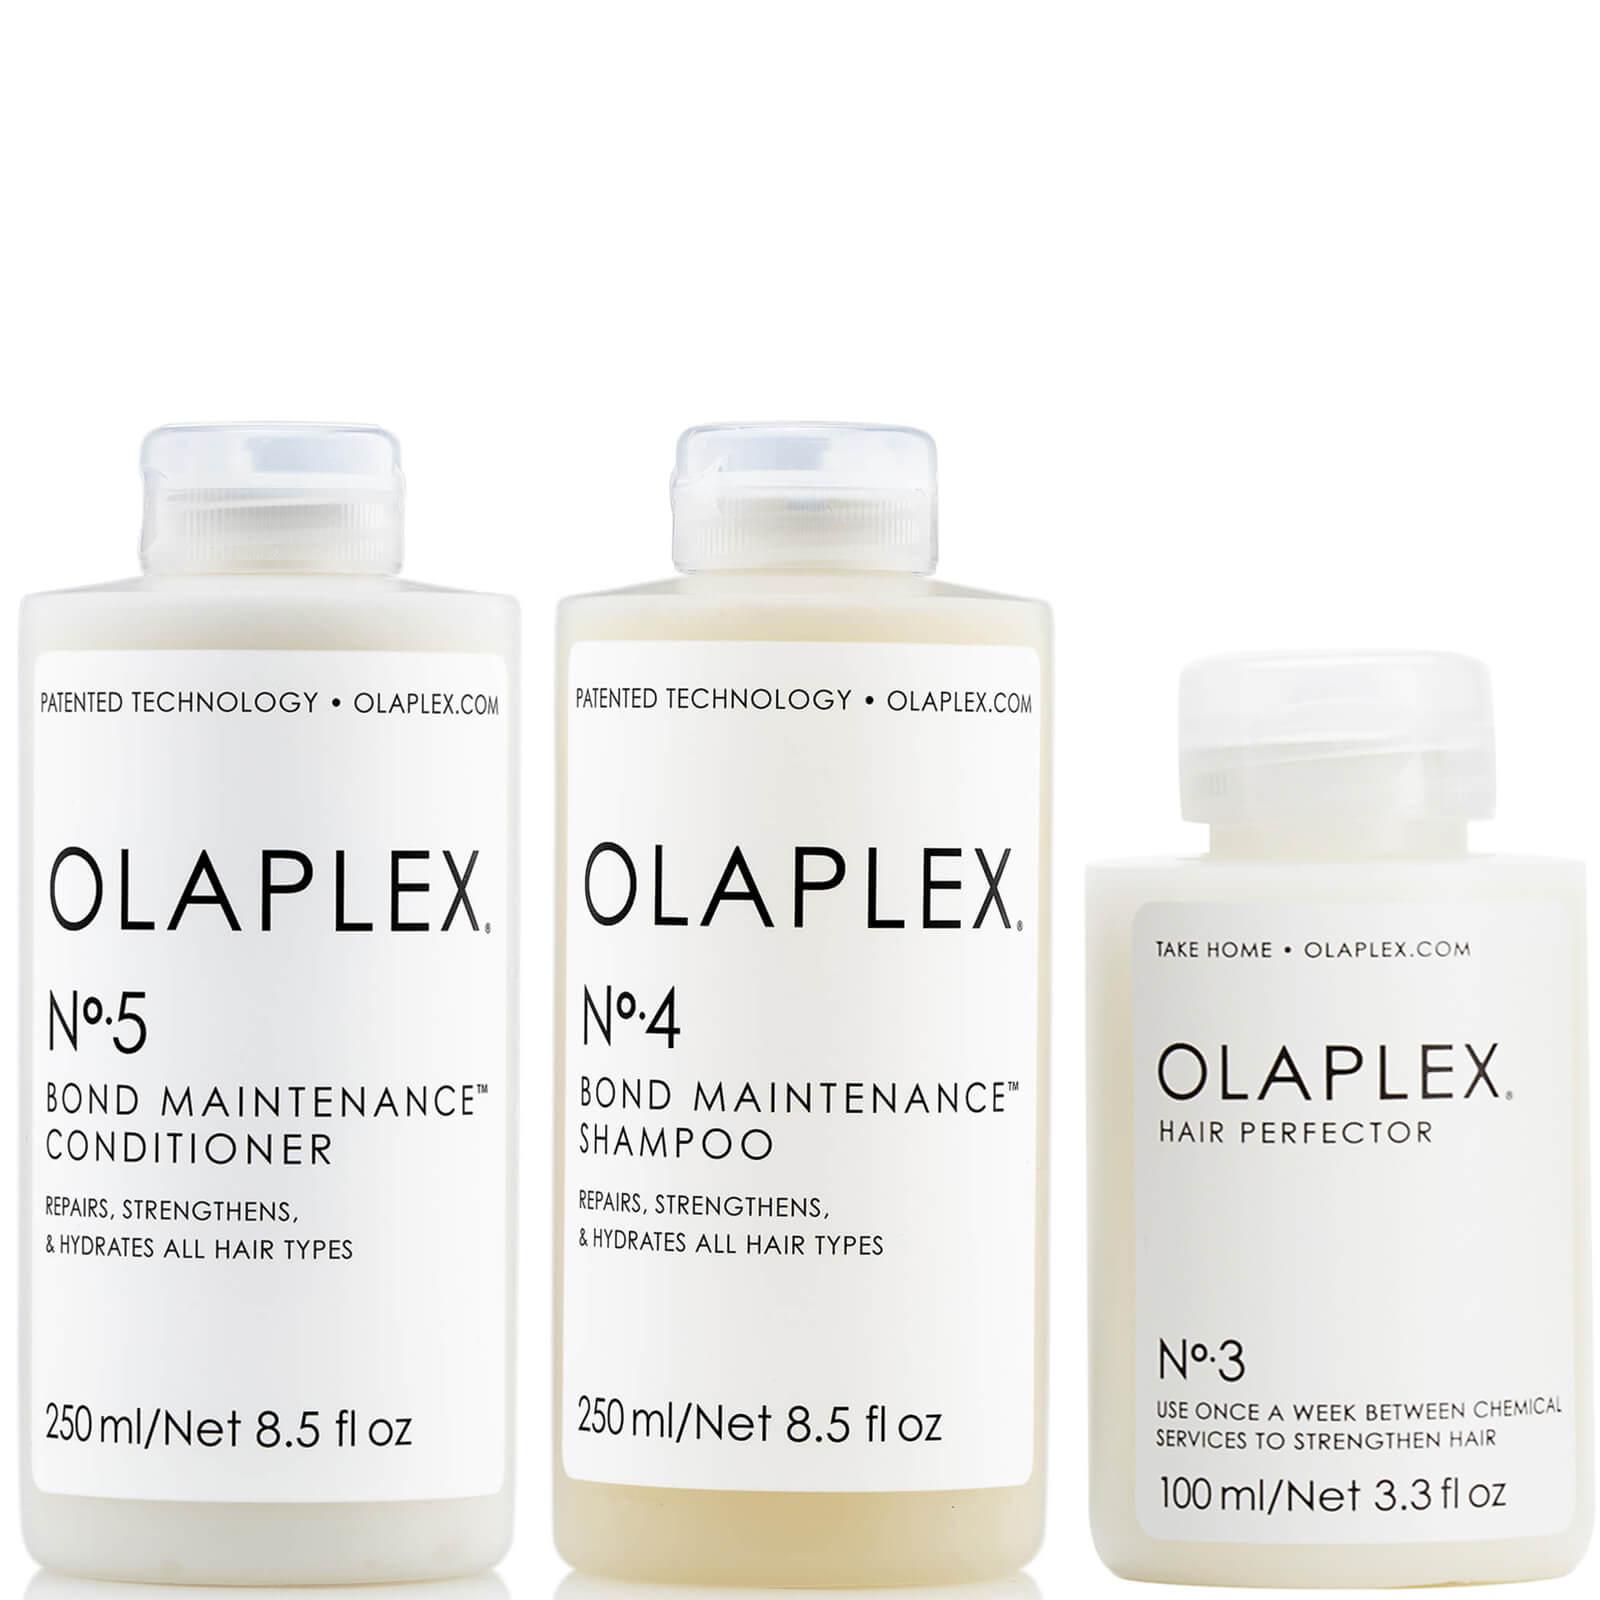 Olaplex Hero Bundle £66.30 + Upto 2% TCB+Free Delivery @ Look Fantastic